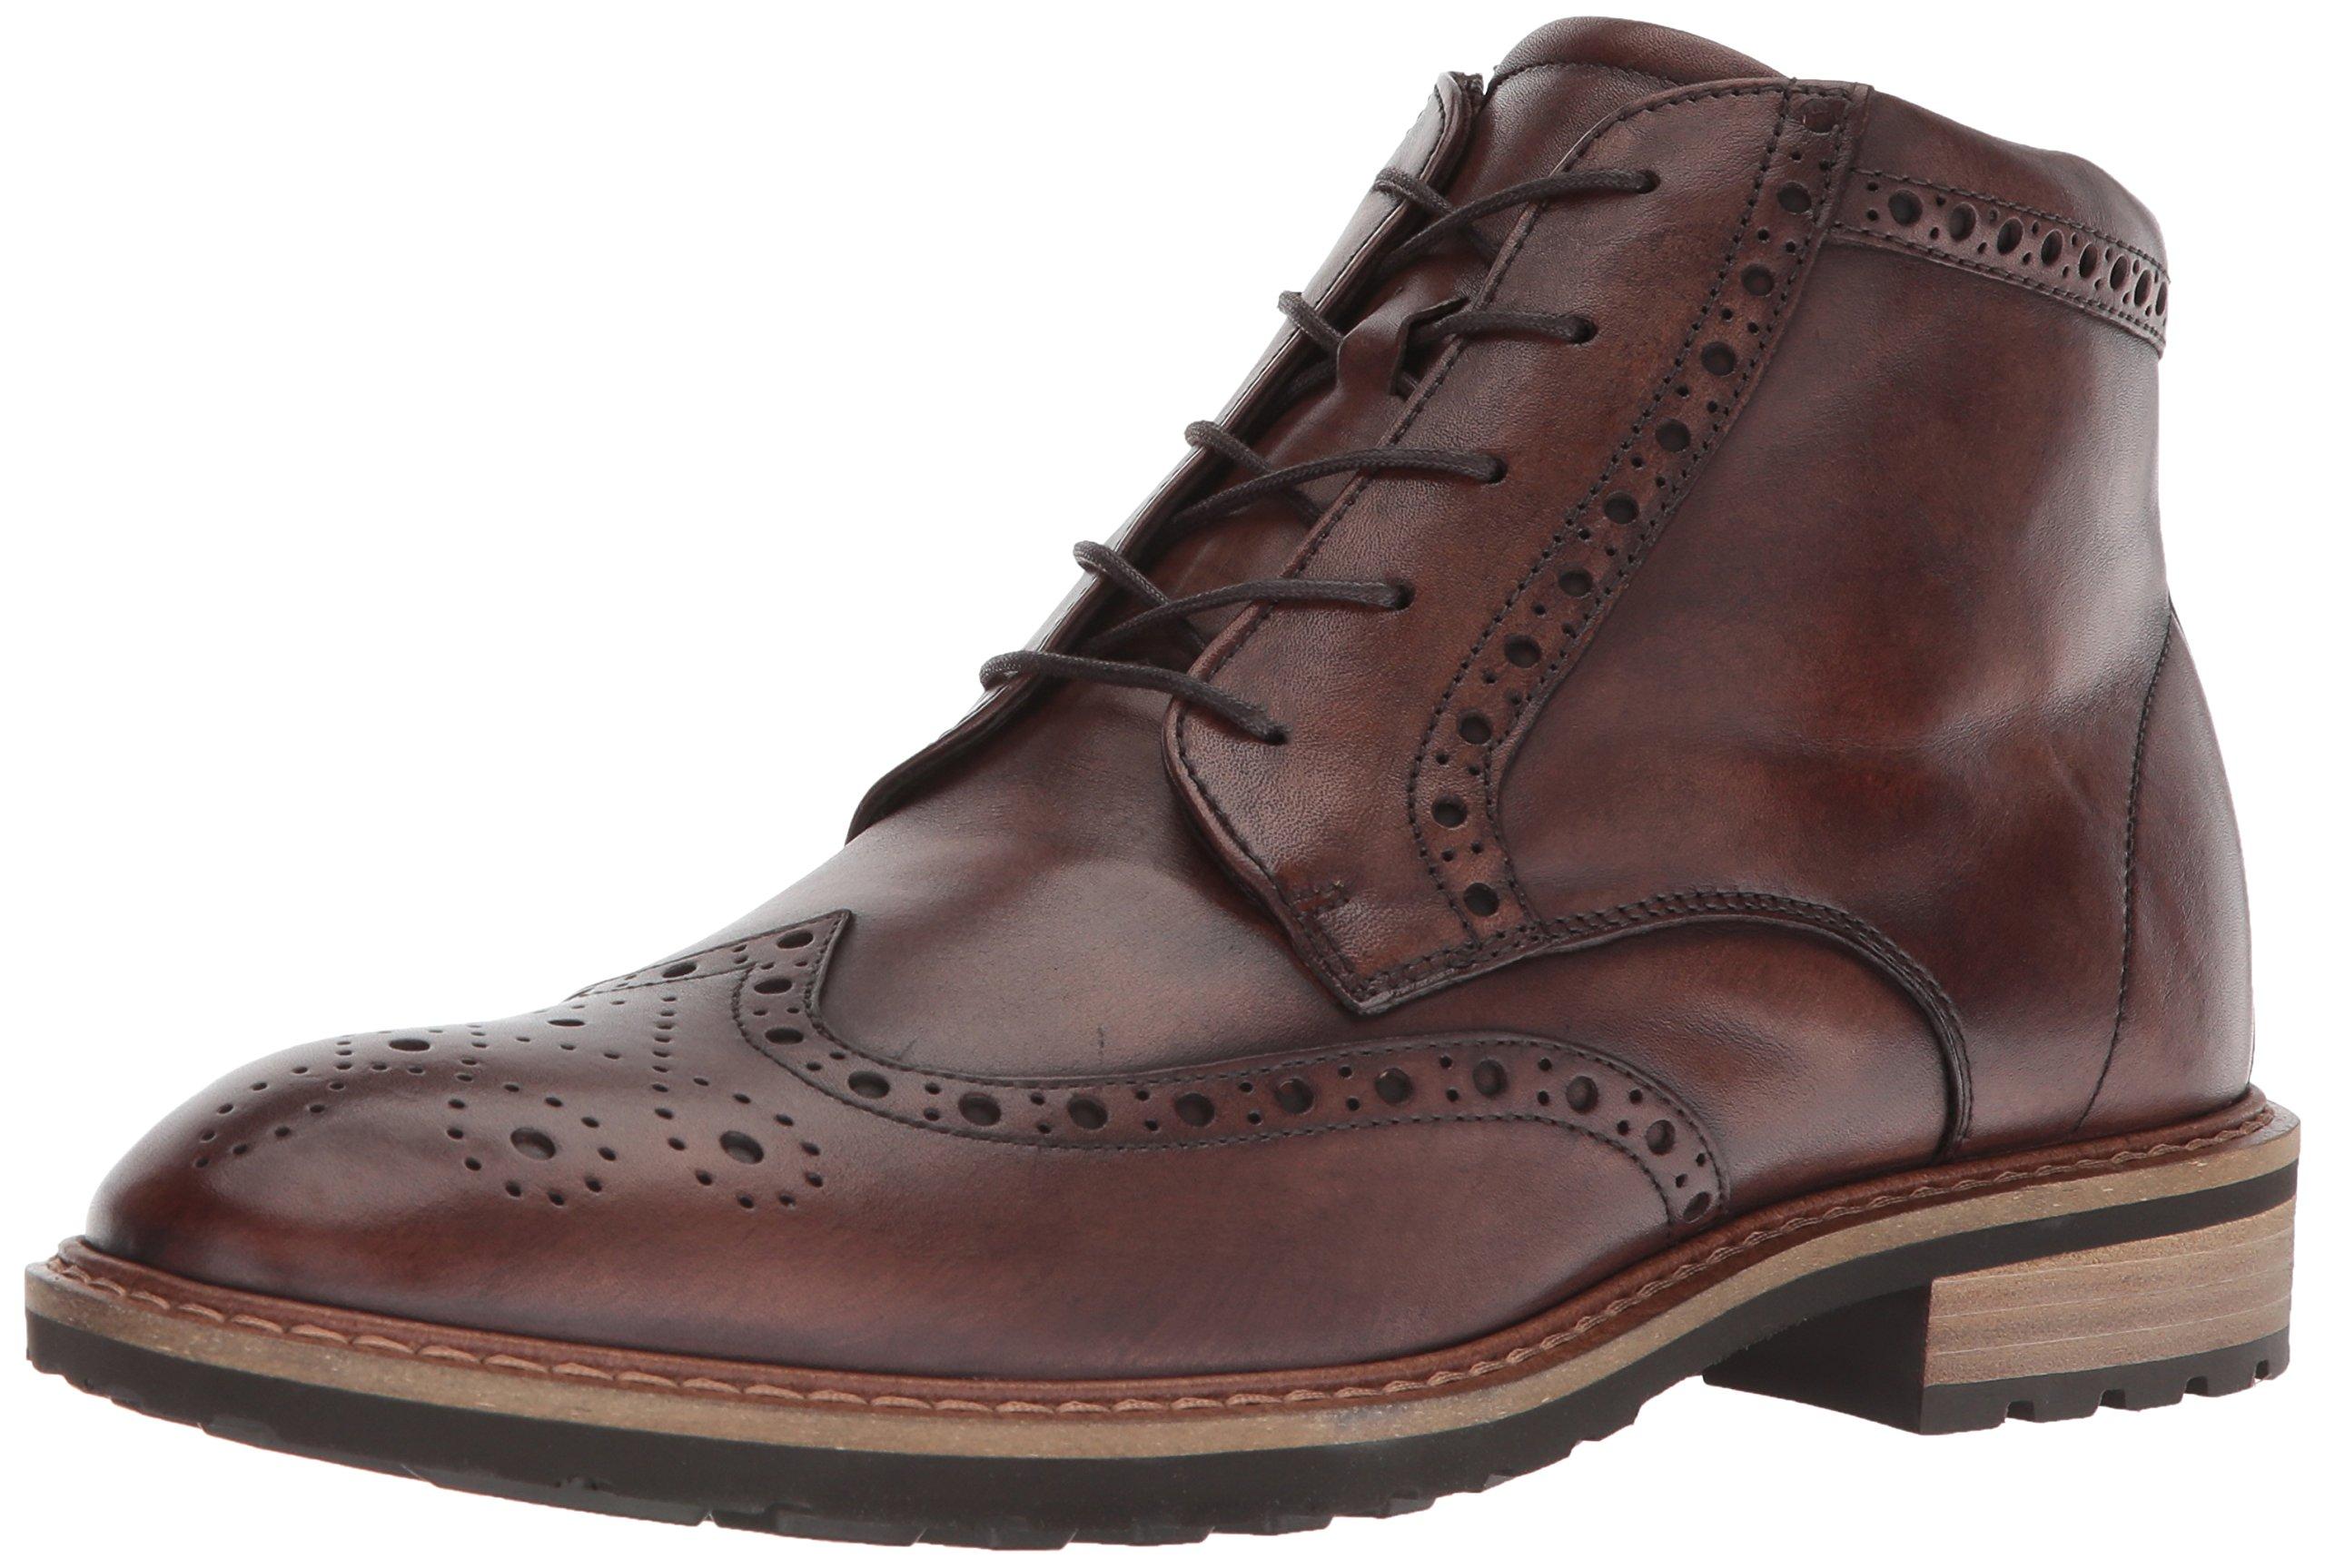 ECCO Men's Vitrus I Tie Oxford Boot, Nature Wingtip, 43 M EU (9-9.5 US)